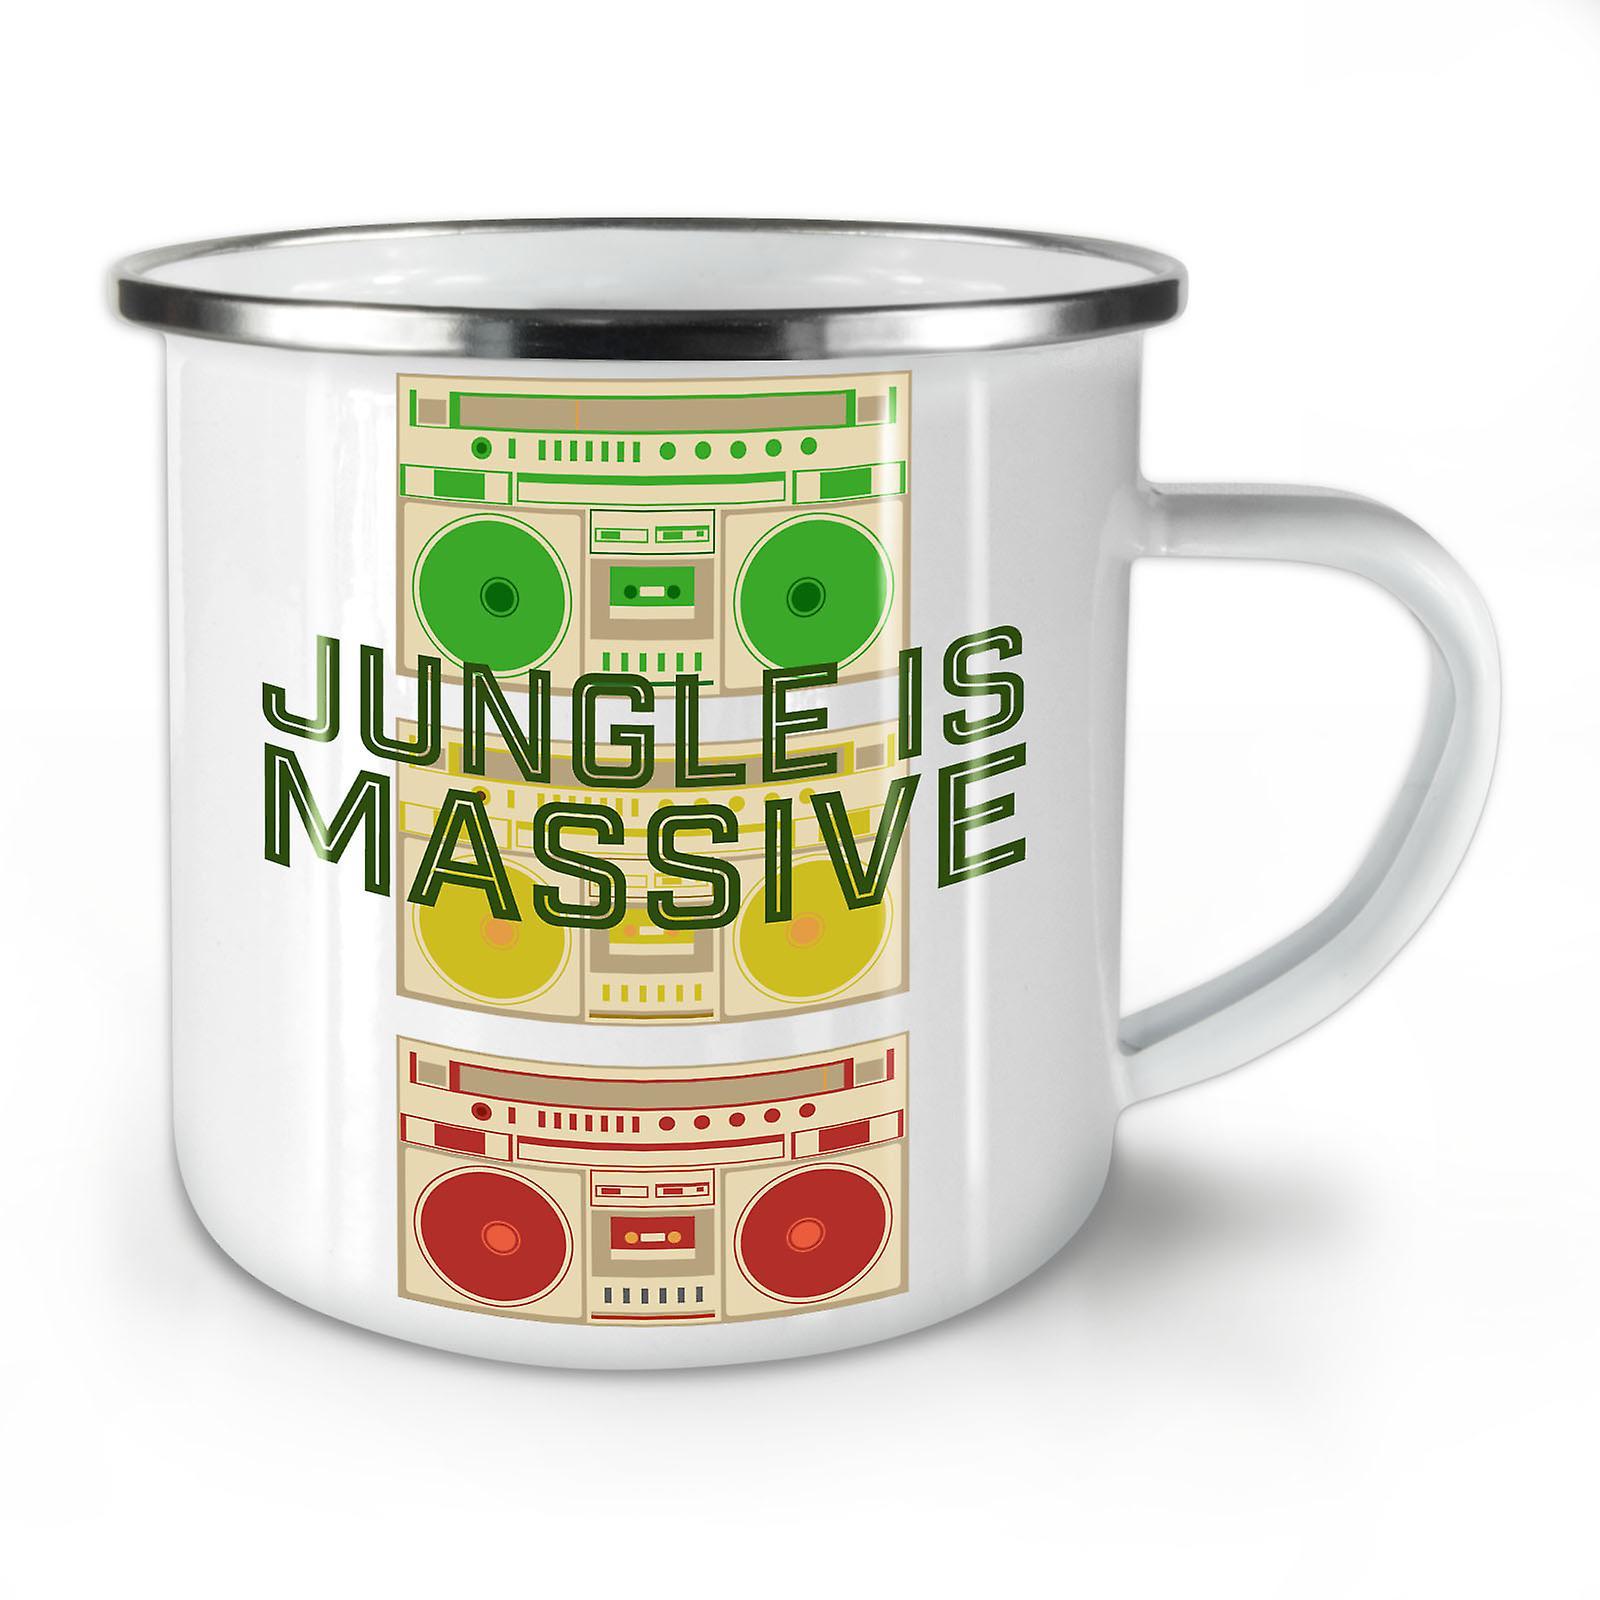 Cannabis Whitetea Mug10 Nouvelles Jungle Émail OzWellcoda Café 42 Yy76bfg